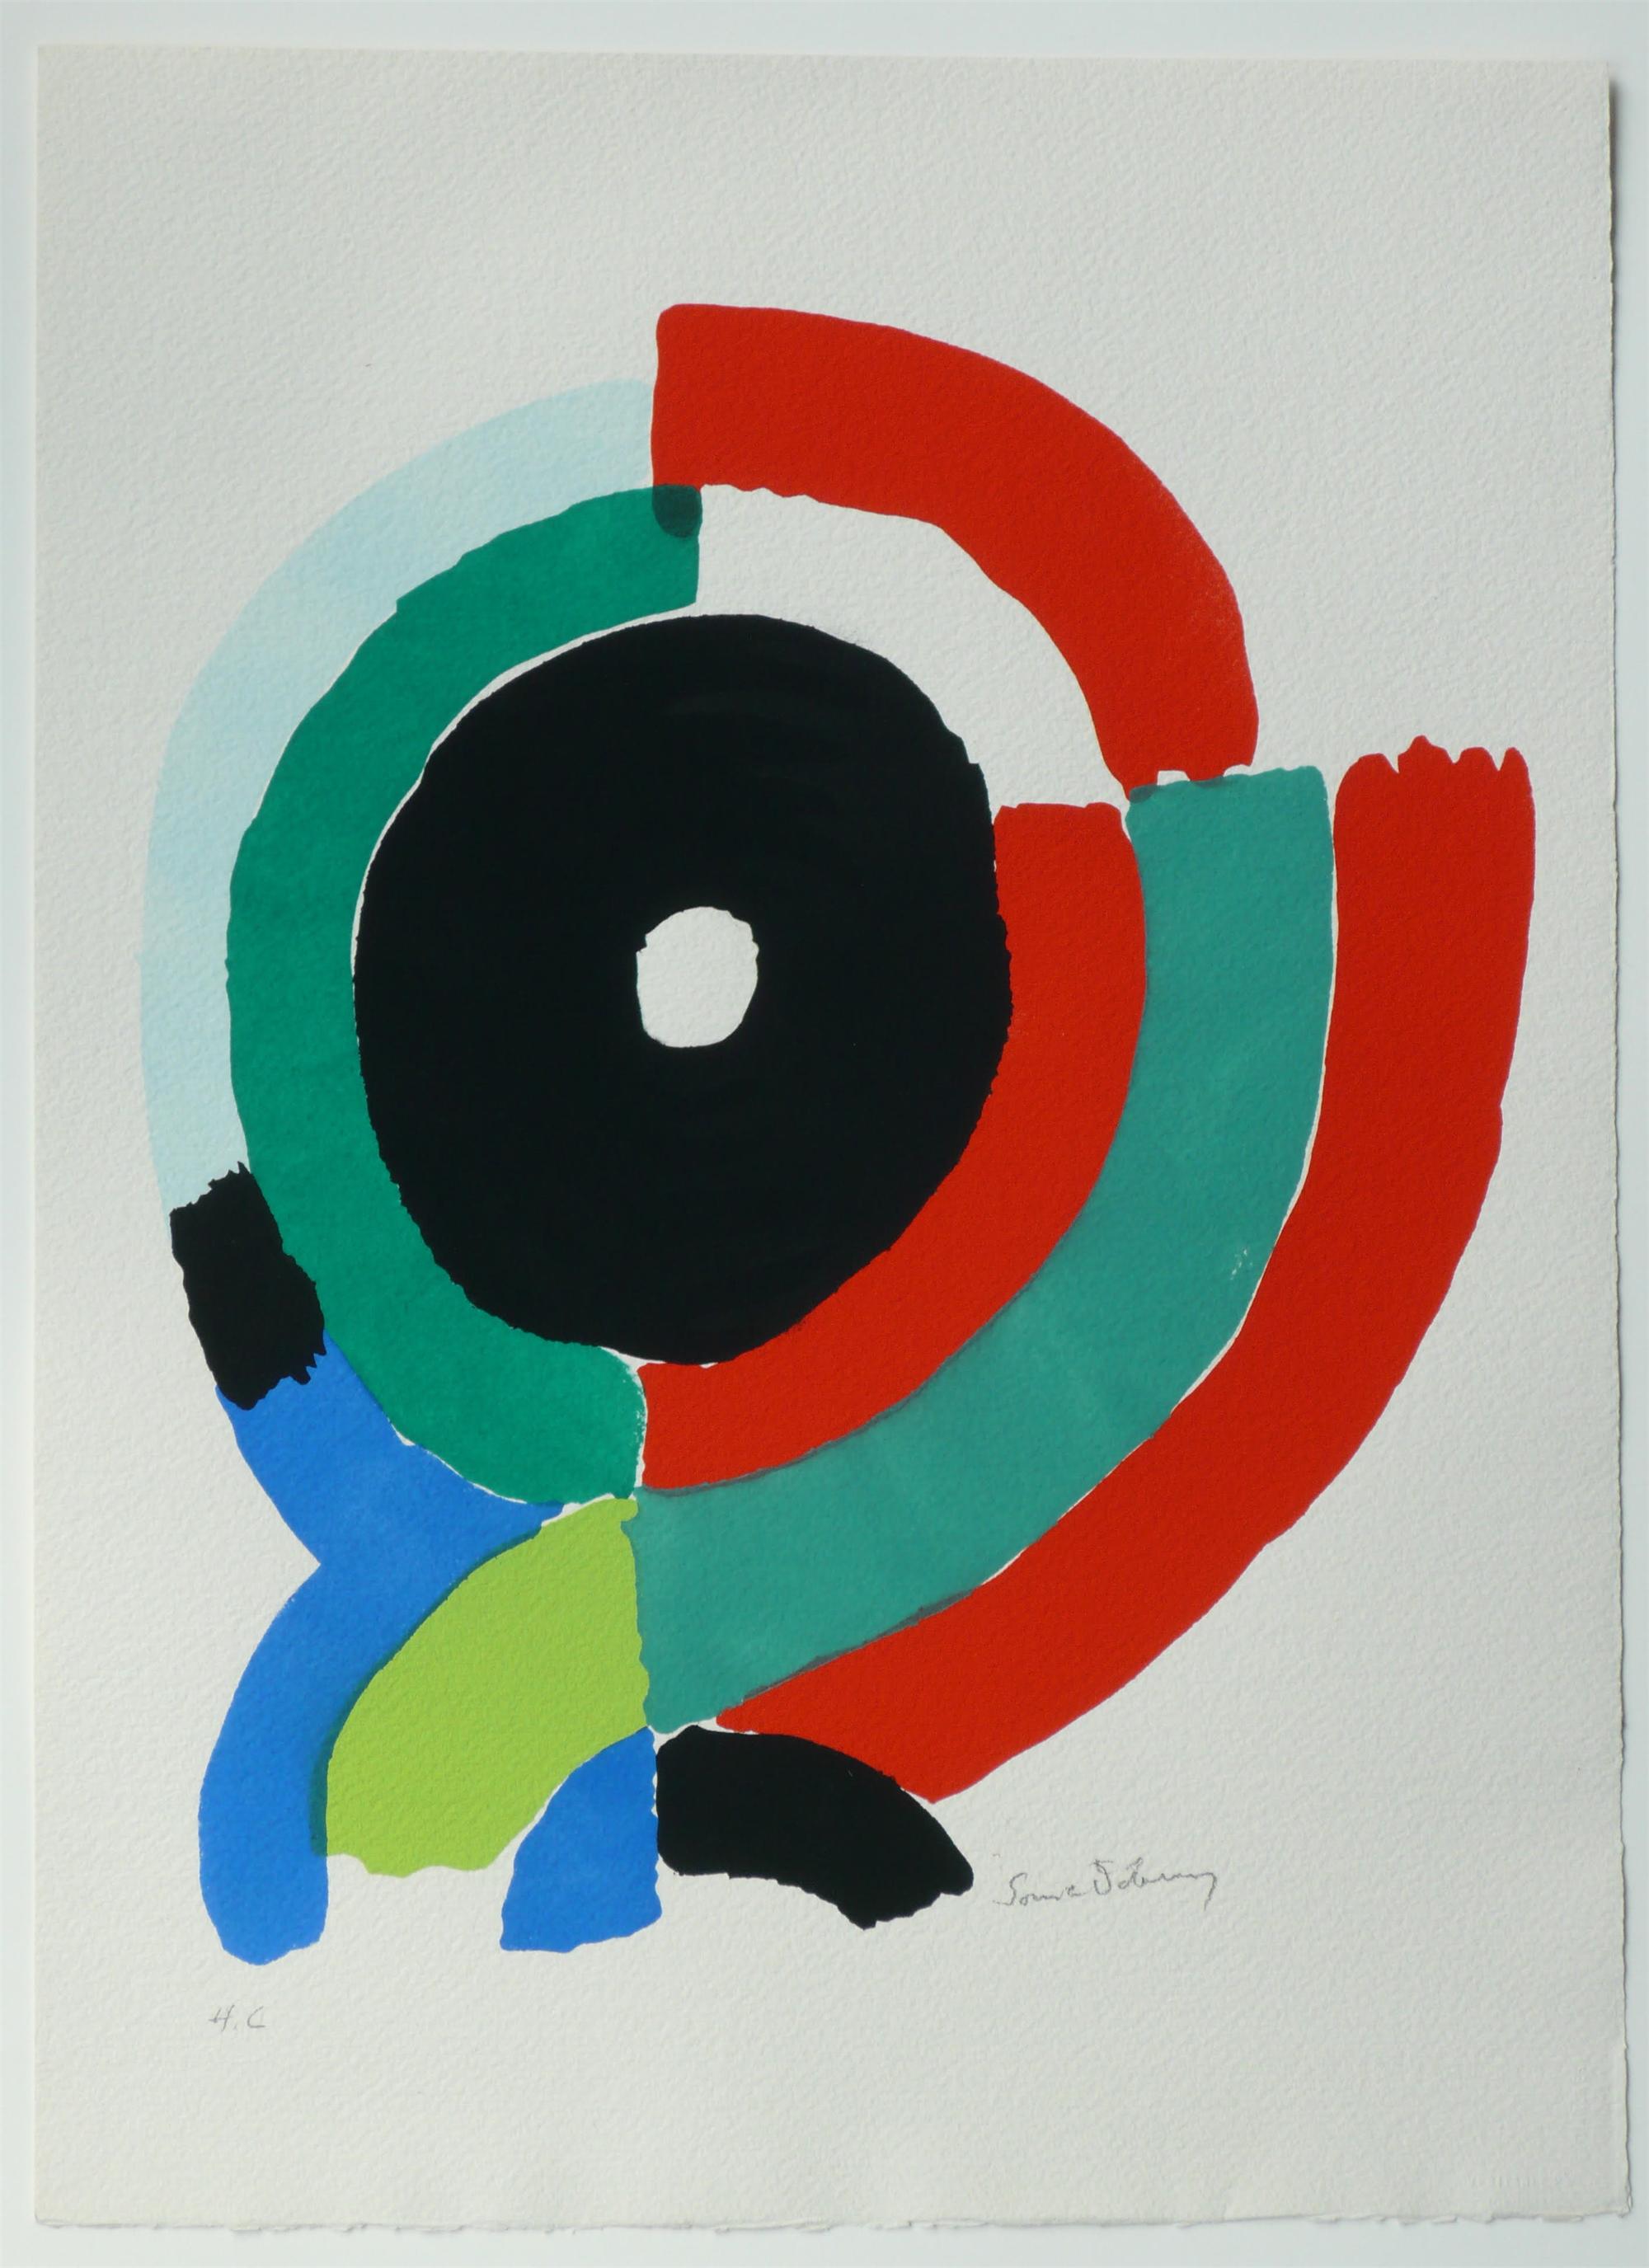 Pochoir from Les Illuminations de Rimbaud by Sonia Delaunay